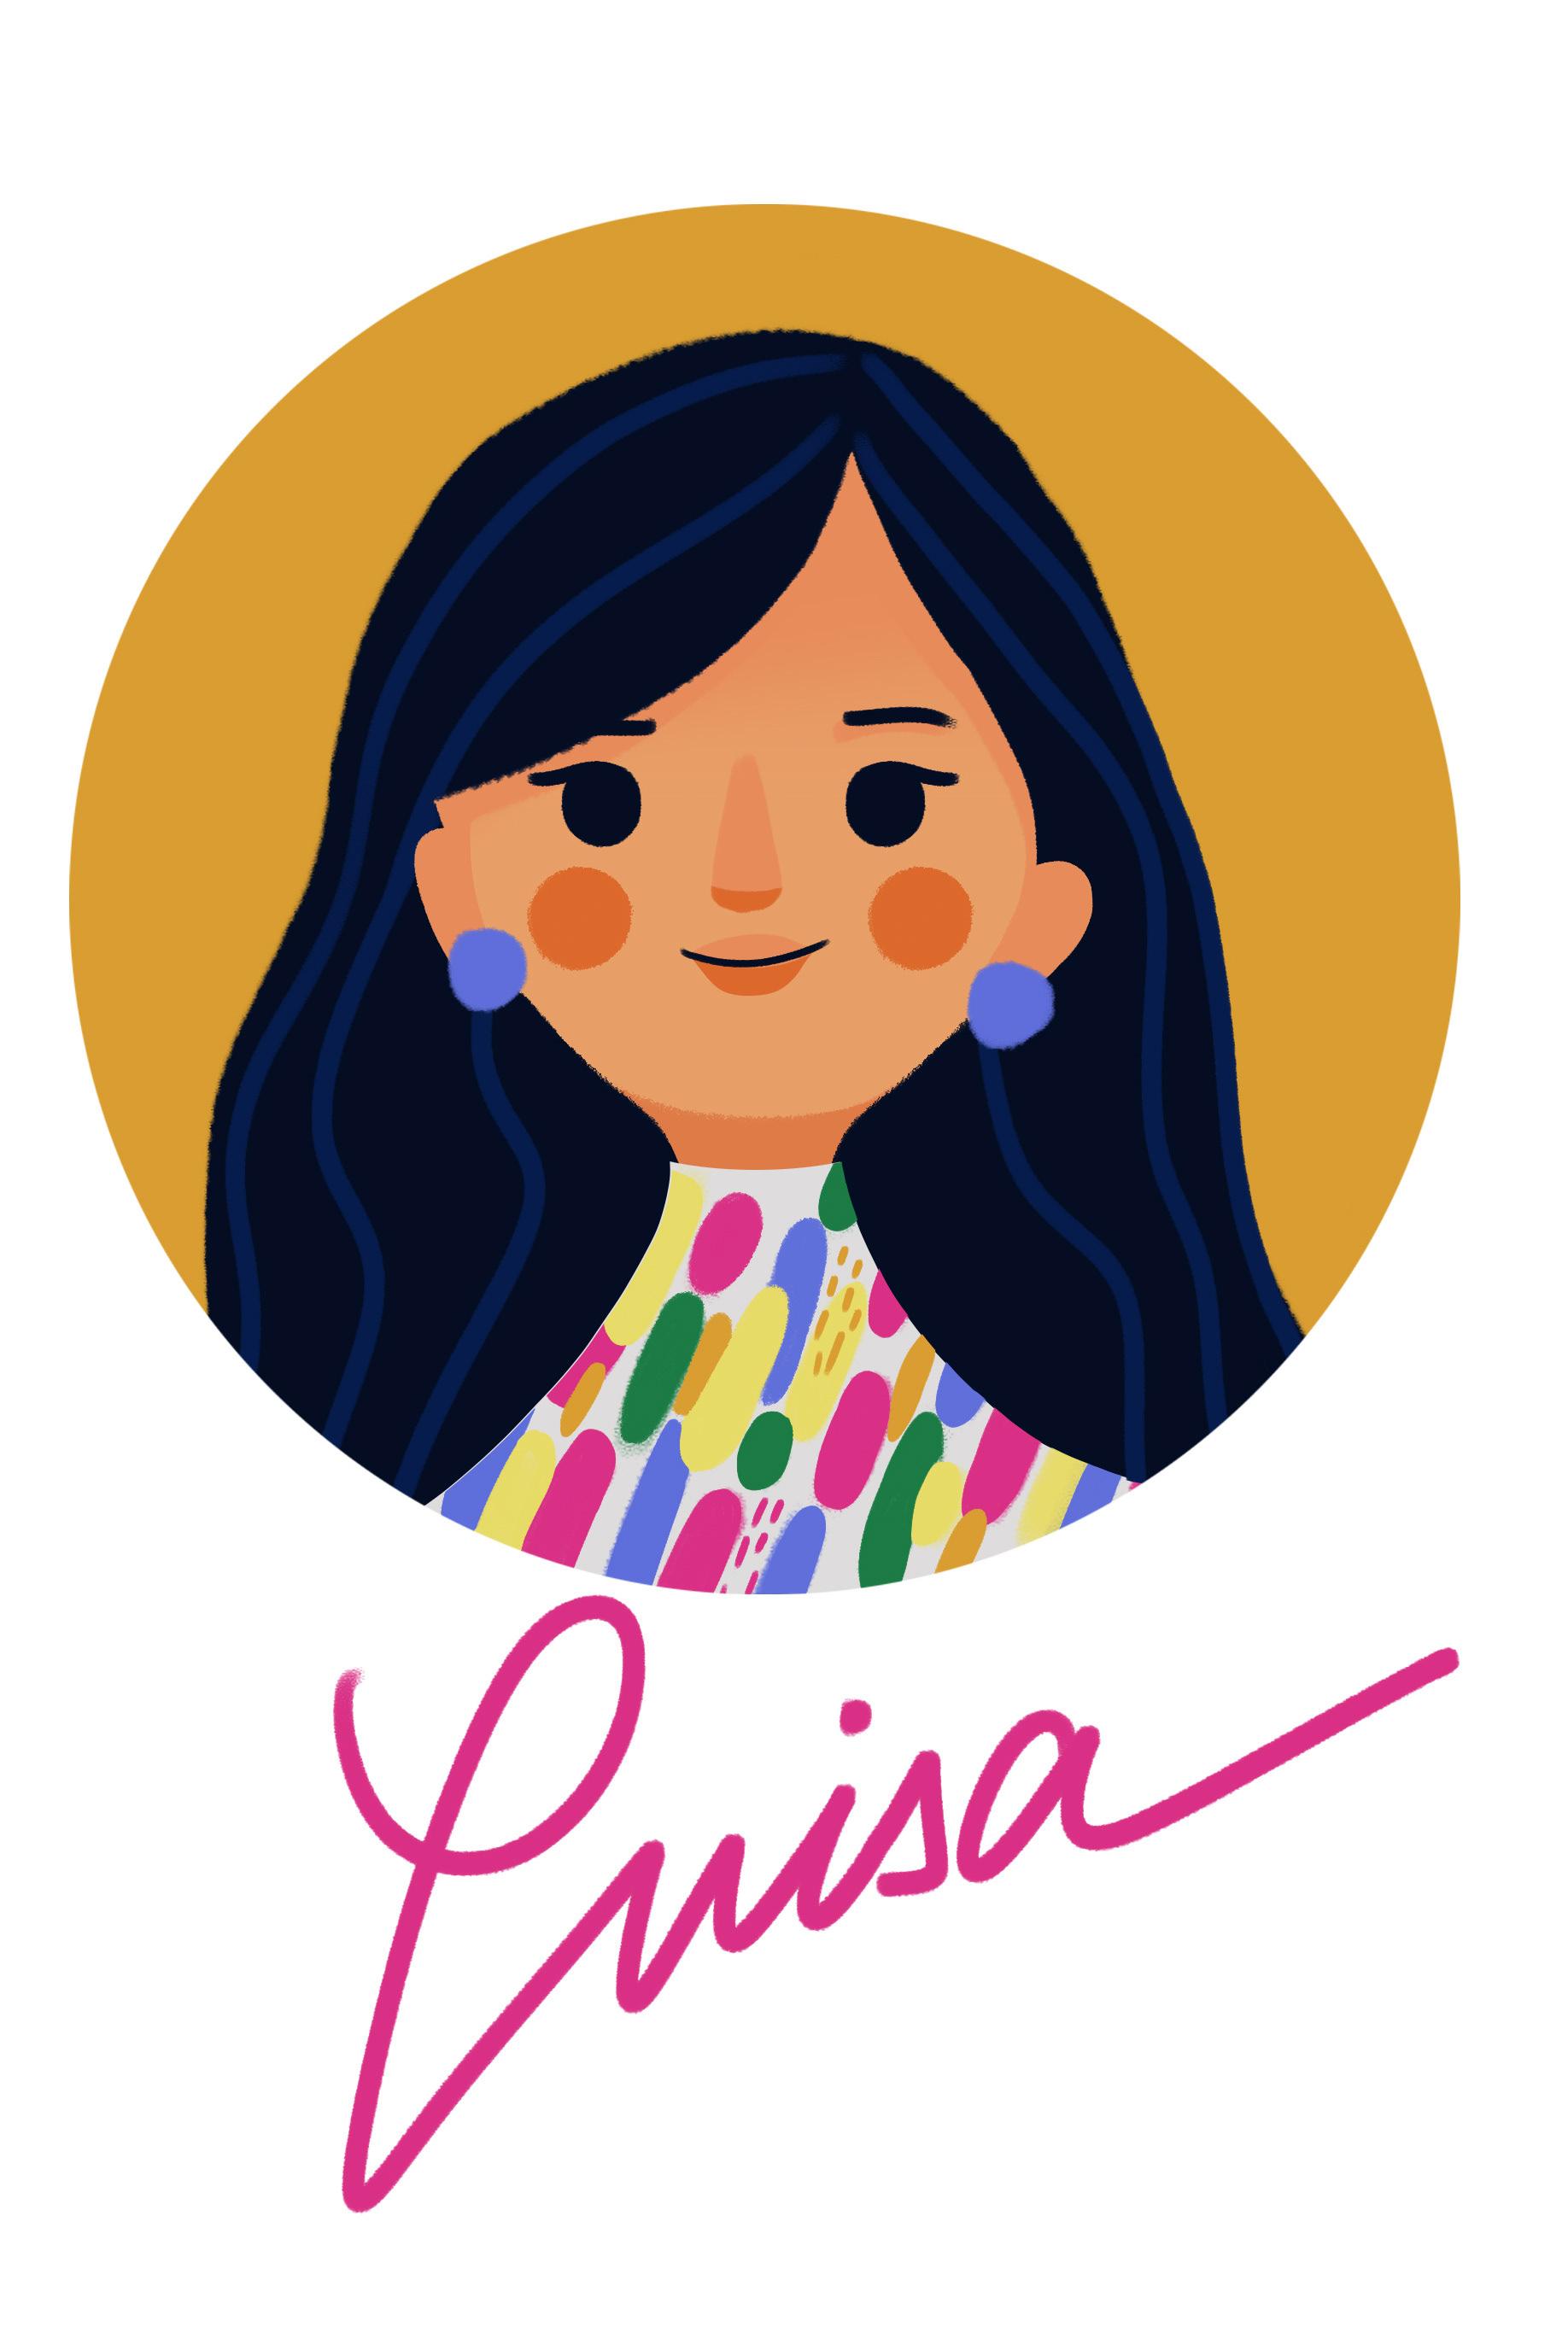 Luisa Leal